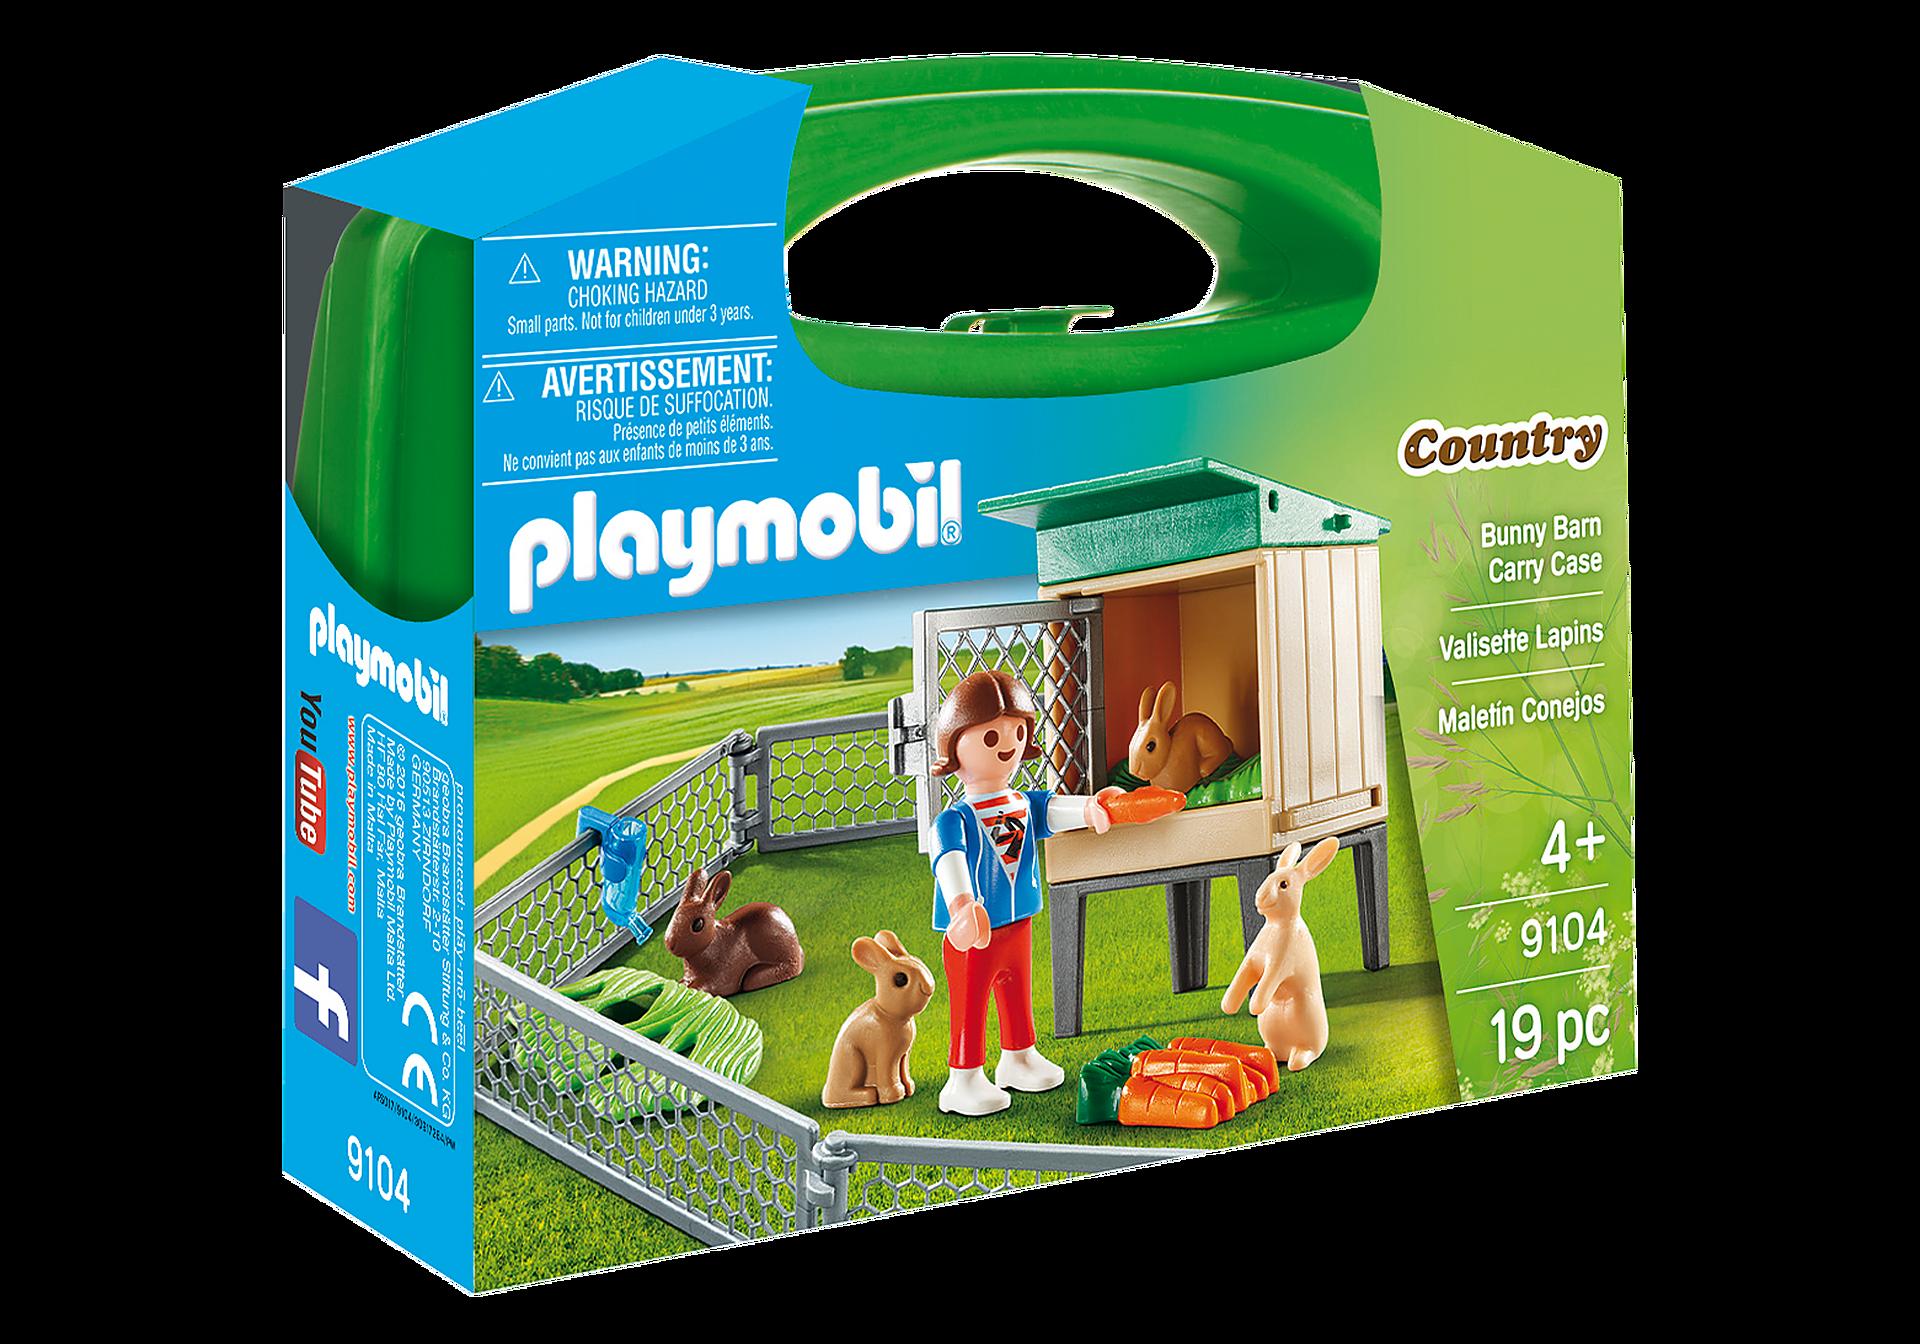 http://media.playmobil.com/i/playmobil/9104_product_box_front/Bunny Barn Carry Case